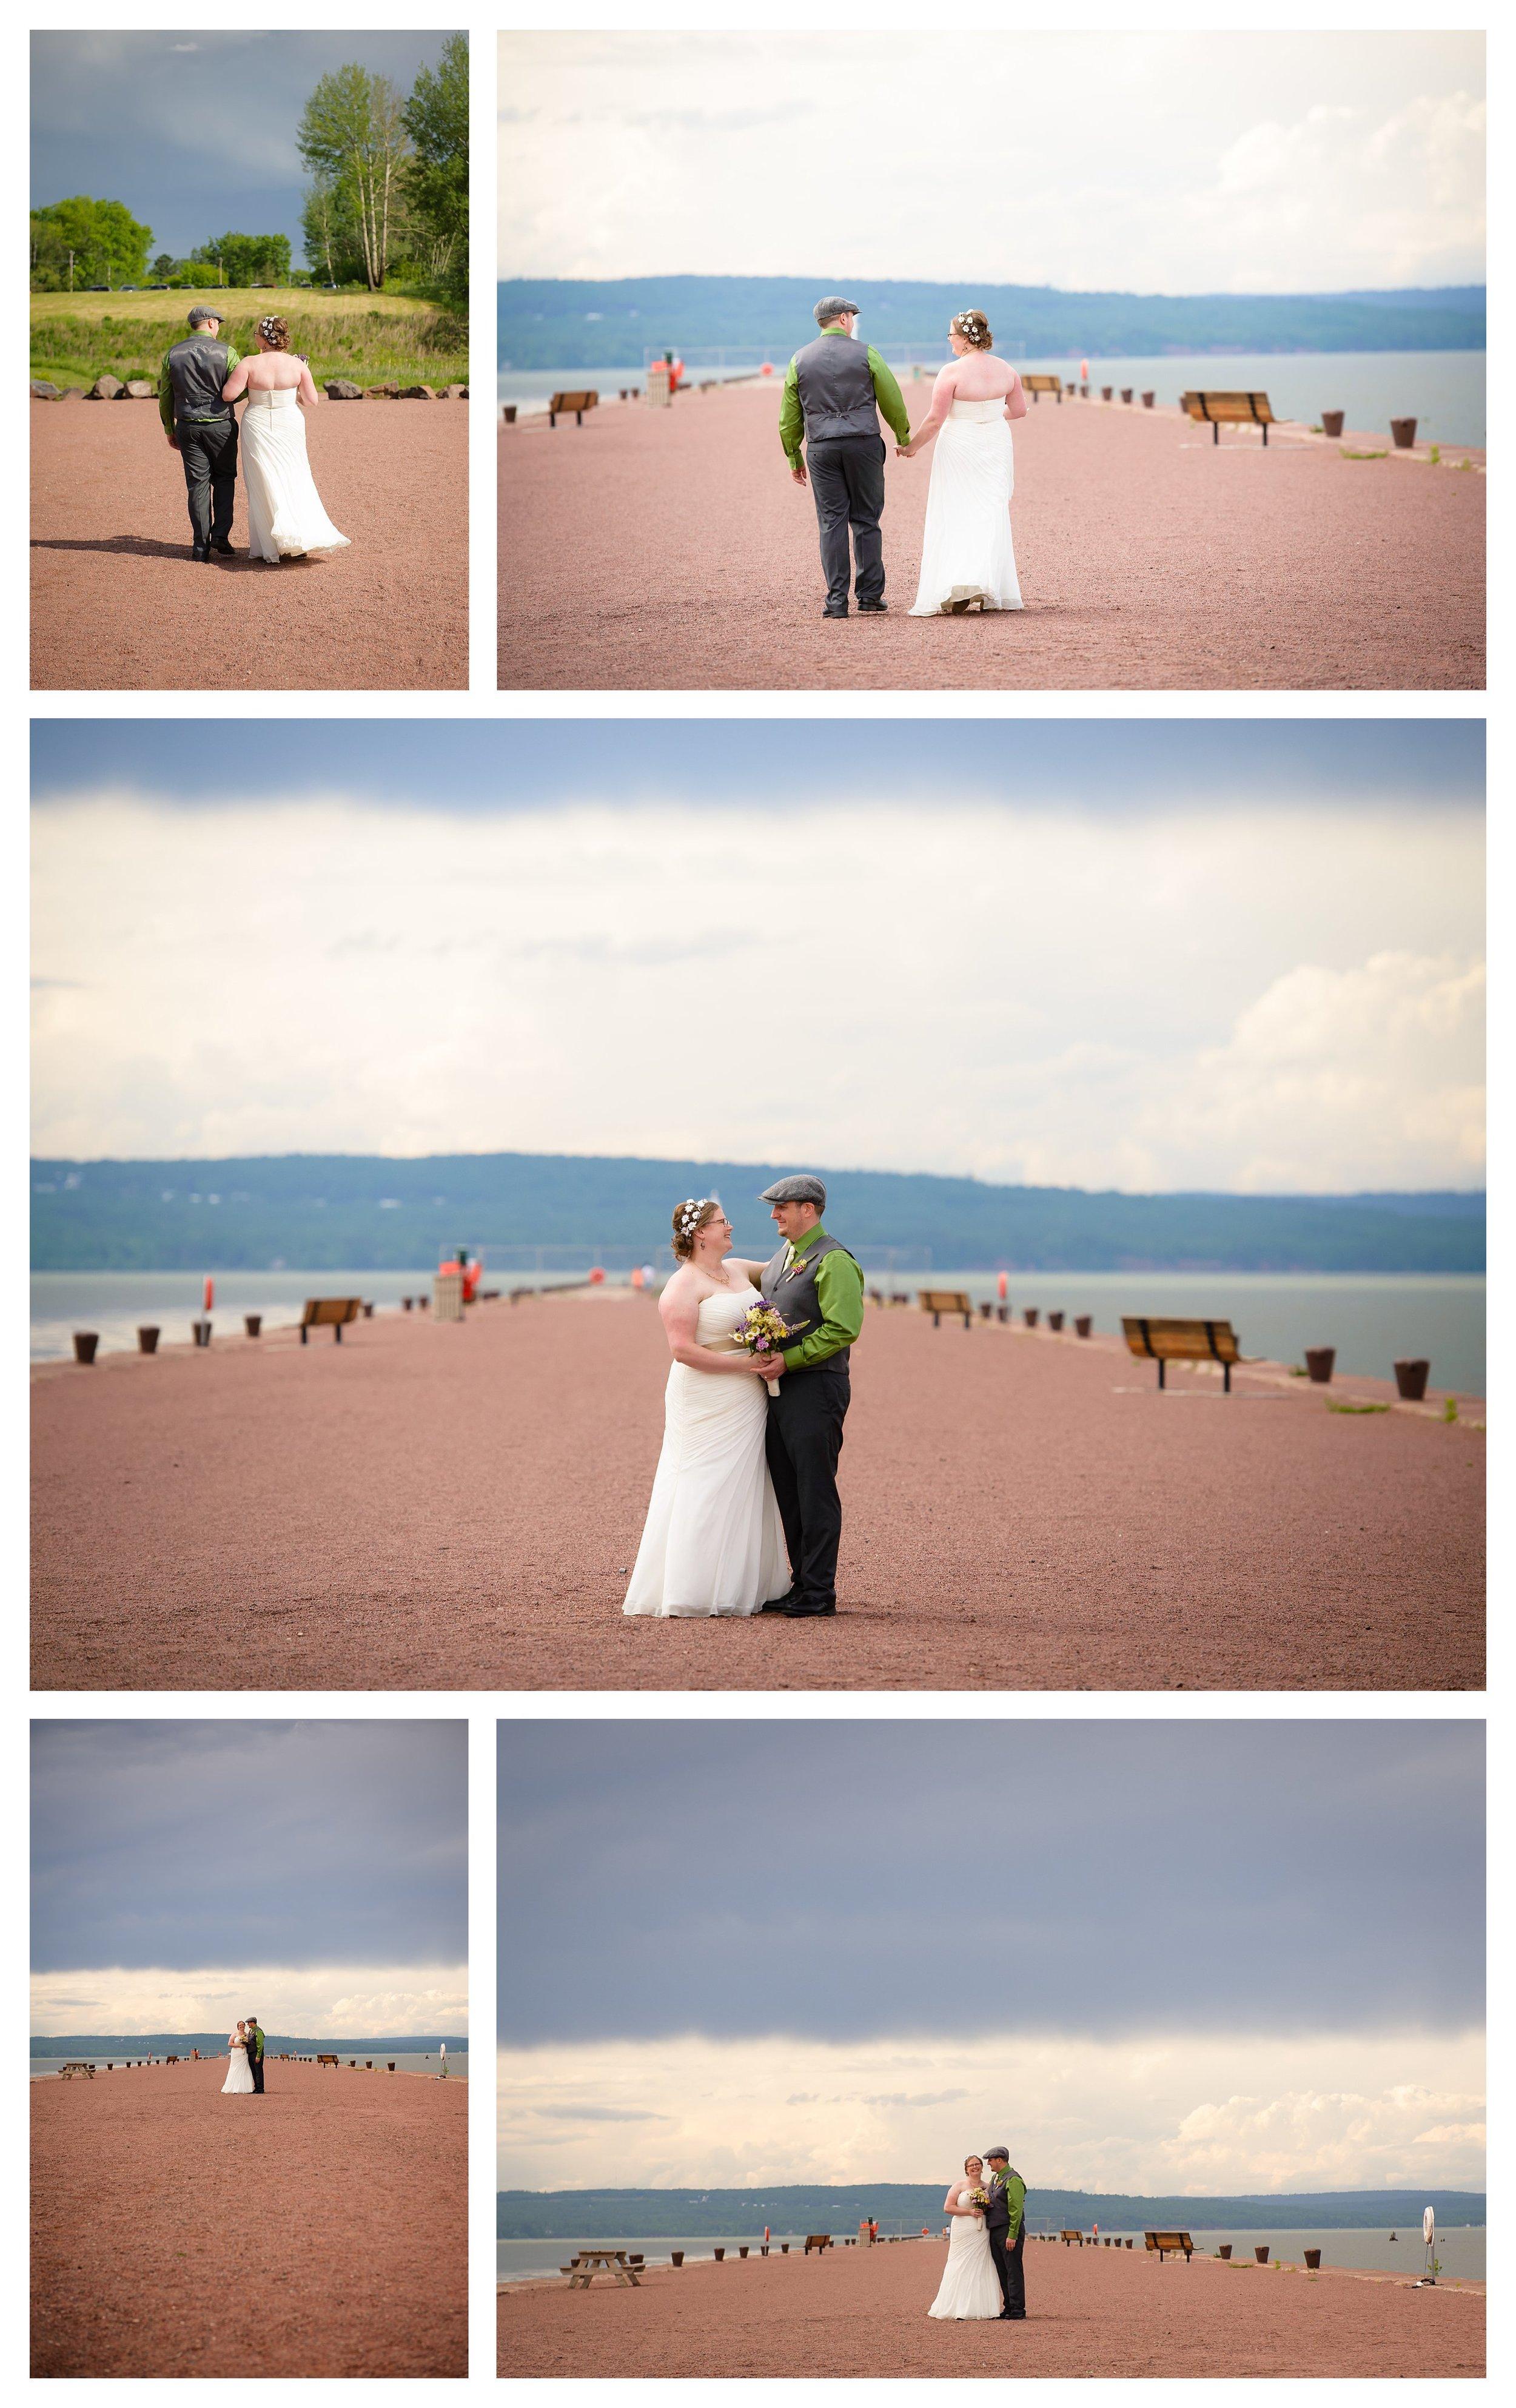 ashland oredock northwoods wisconsin wedding ps 139 photography_0293.jpg